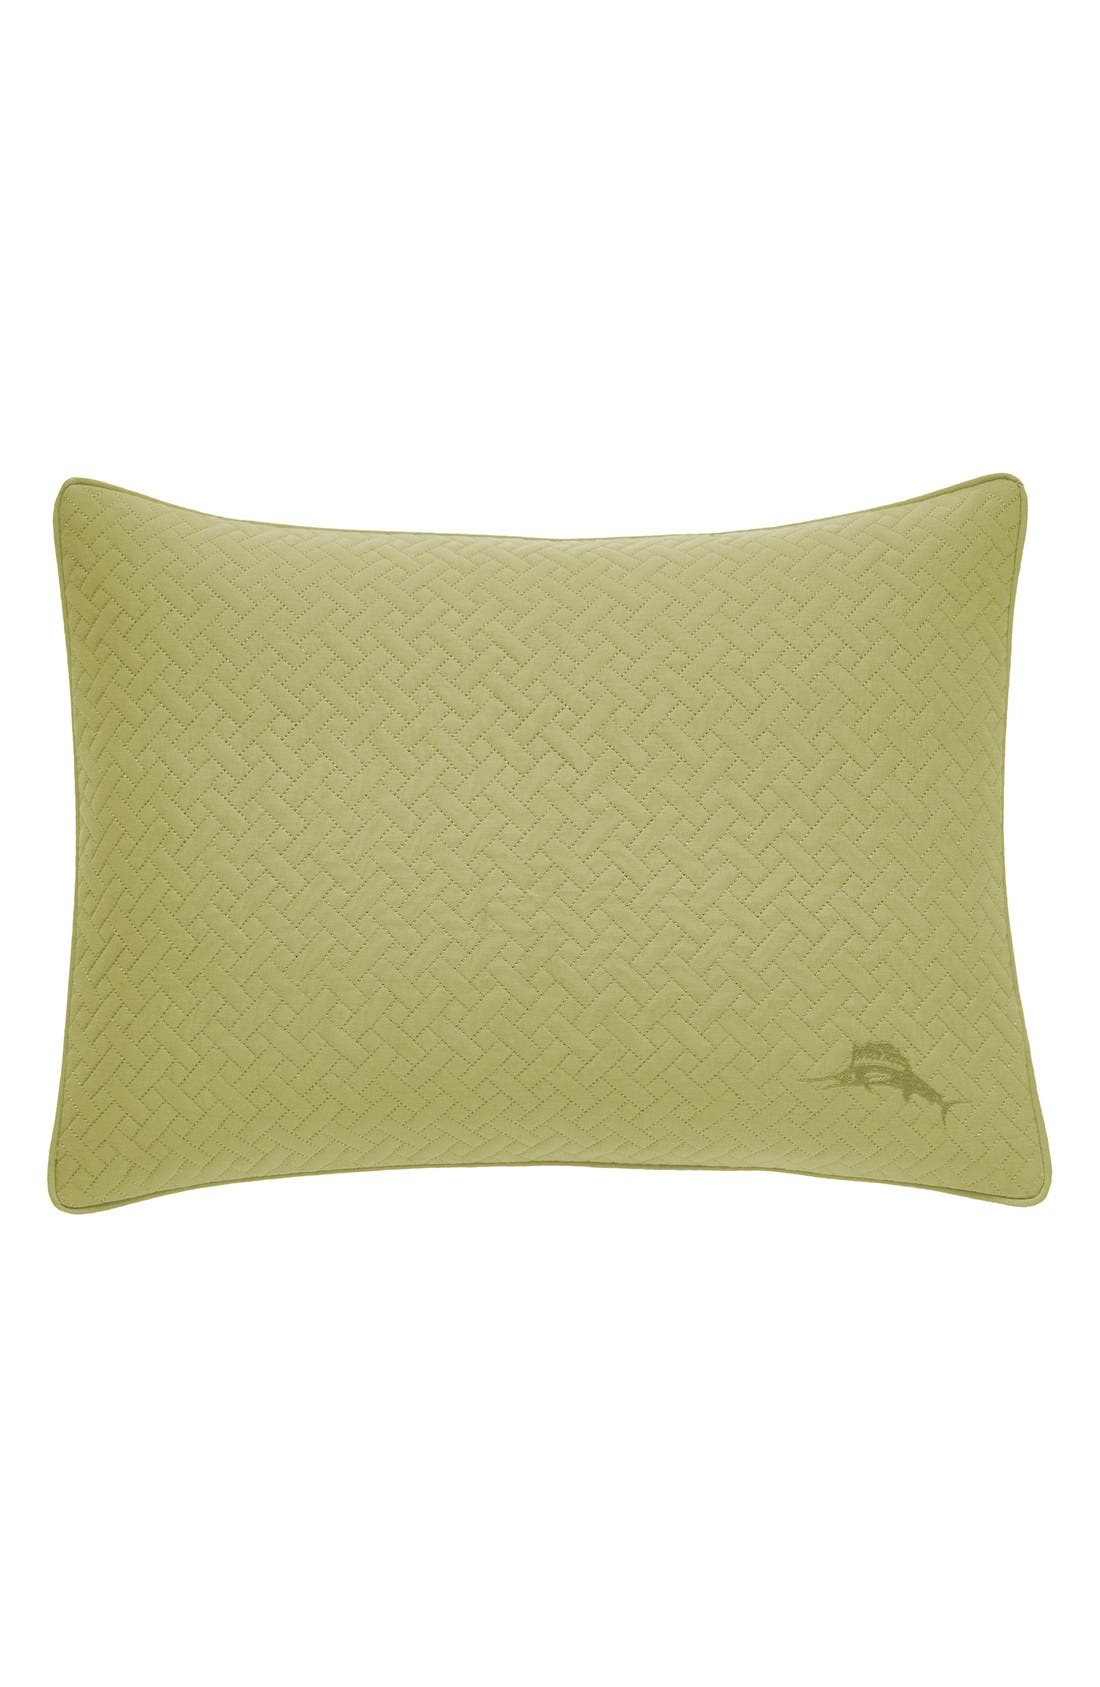 'Kiwi' Pillow,                         Main,                         color, Seaglass